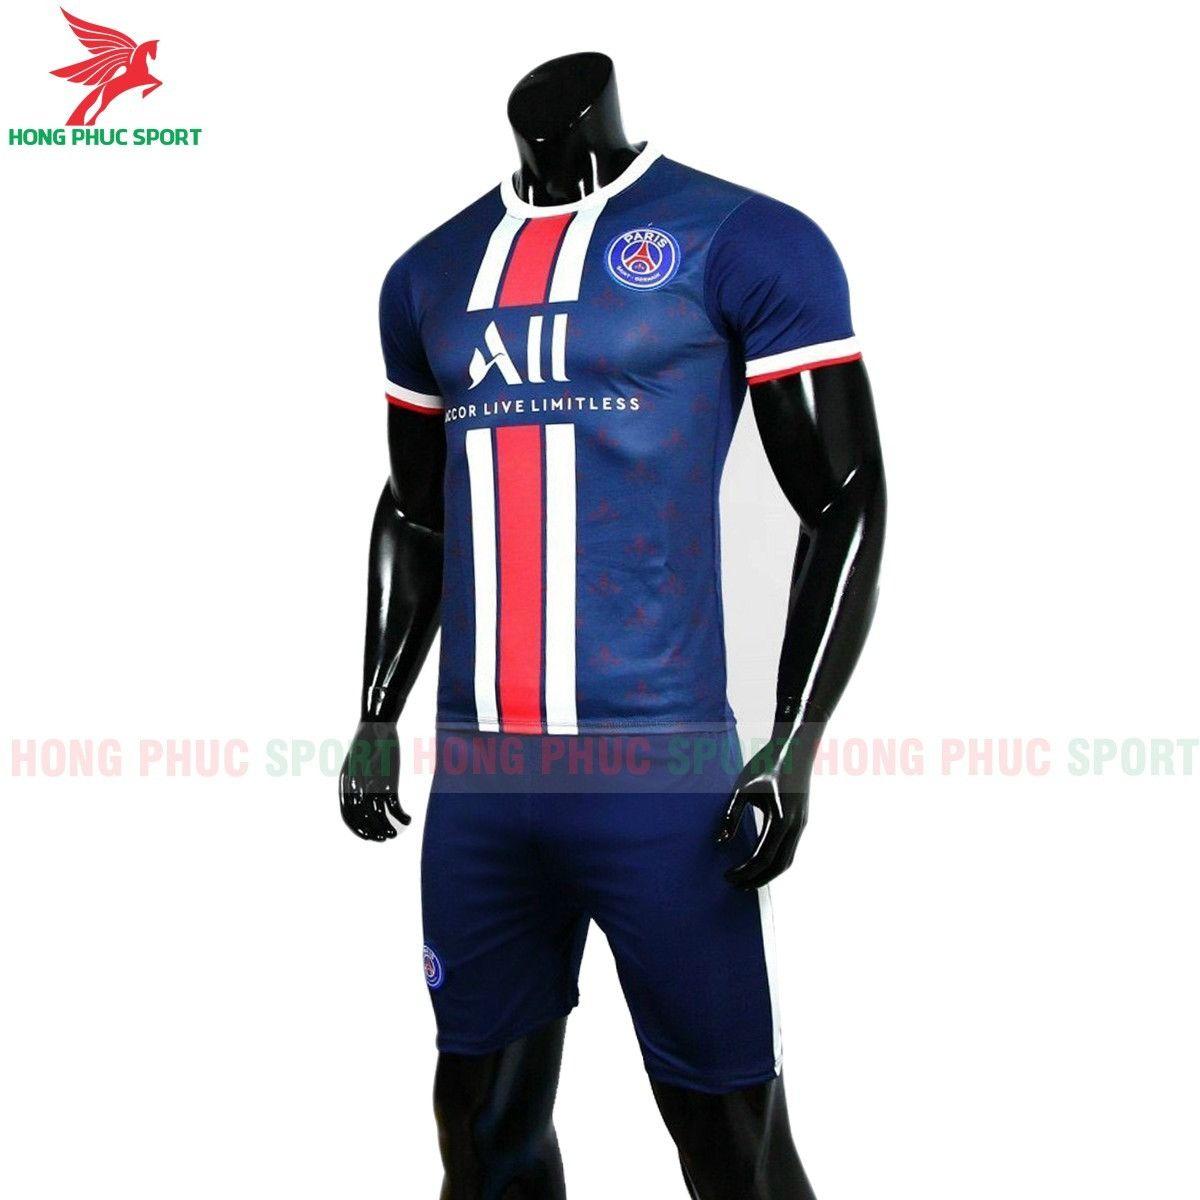 https://cdn.hongphucsport.com/unsafe/s4.shopbay.vn/files/285/ao-bong-da-psg-san-nha-2021-2022-60f501cfb6ab0.jpg